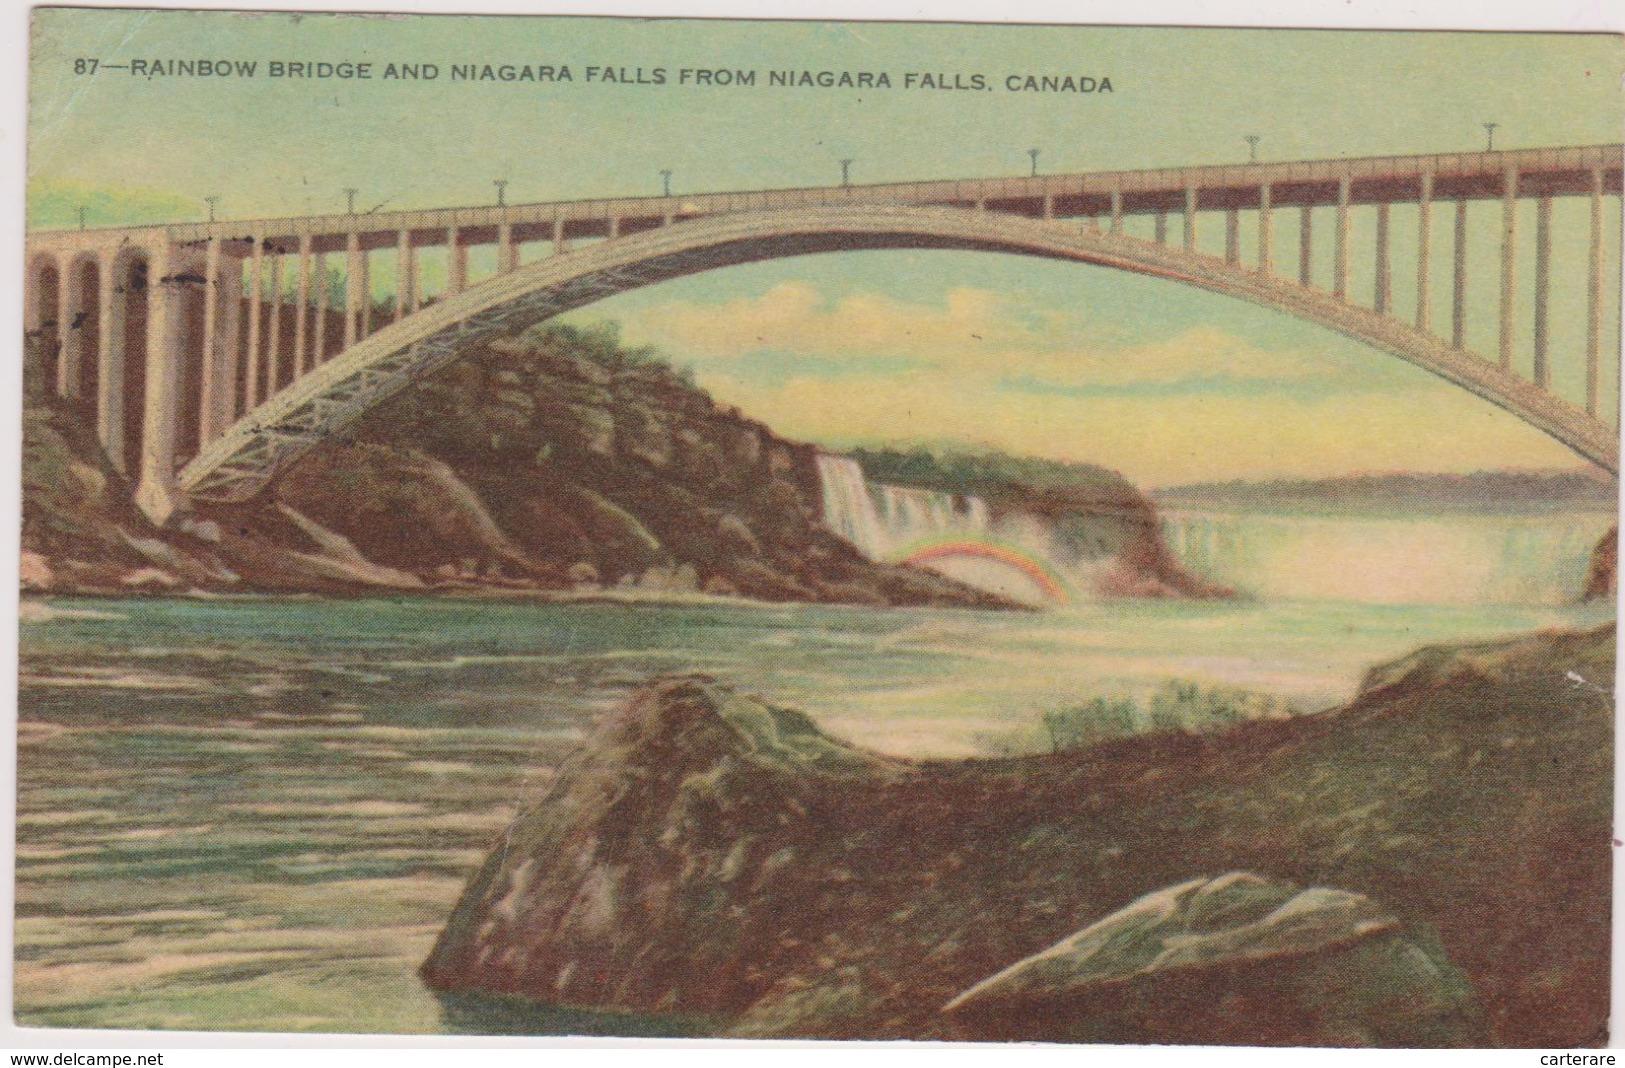 Carte Postale Ancienne,amérique,CANADA,1951,PONT,RAINBOW BRIDGE,NIAGARA - Canada